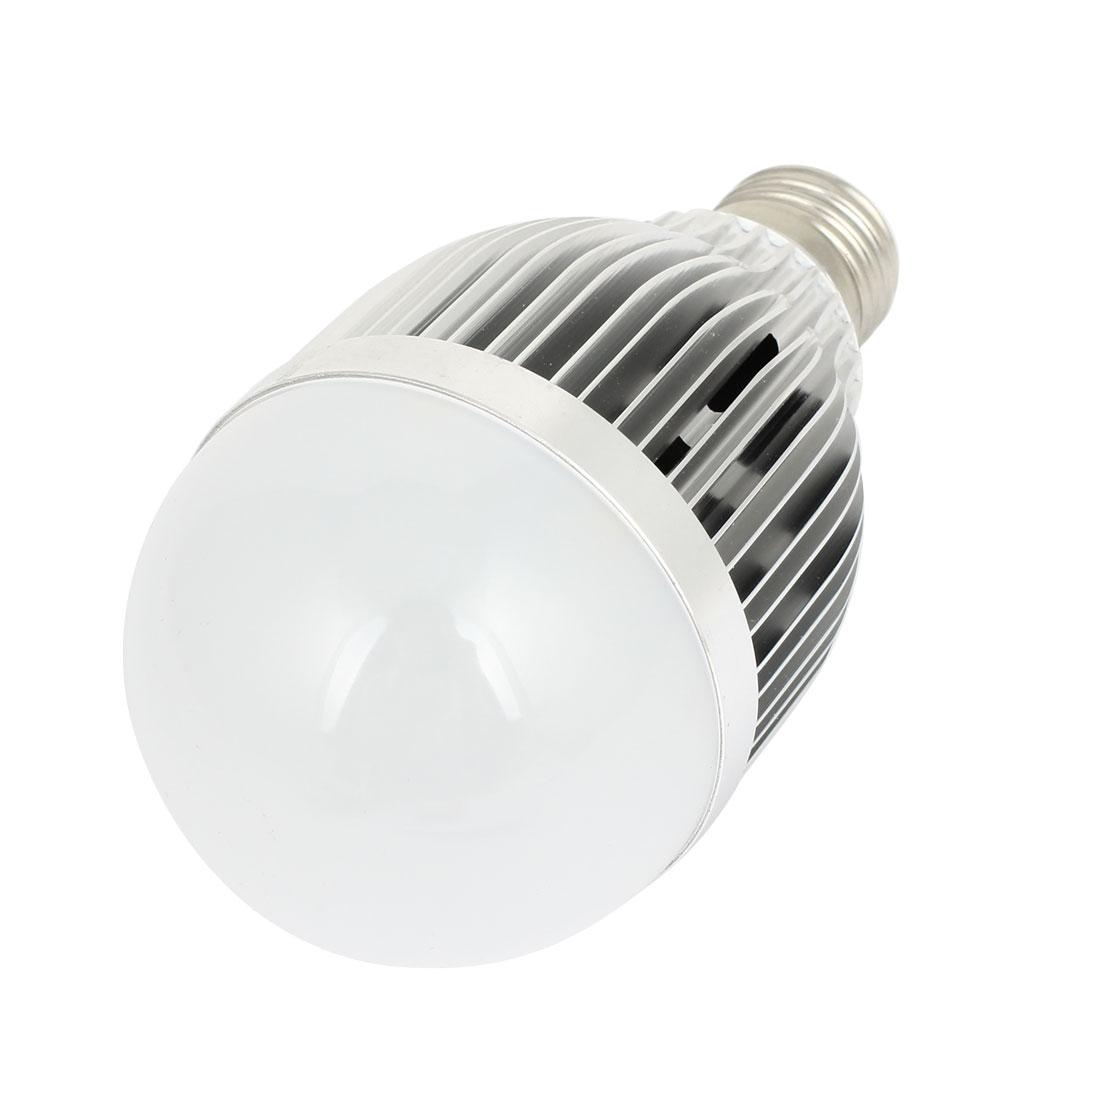 AC 220V 9W 5500-6500K Pure White 18 LED E27 Screw Base Energy Saving Globe Bulb